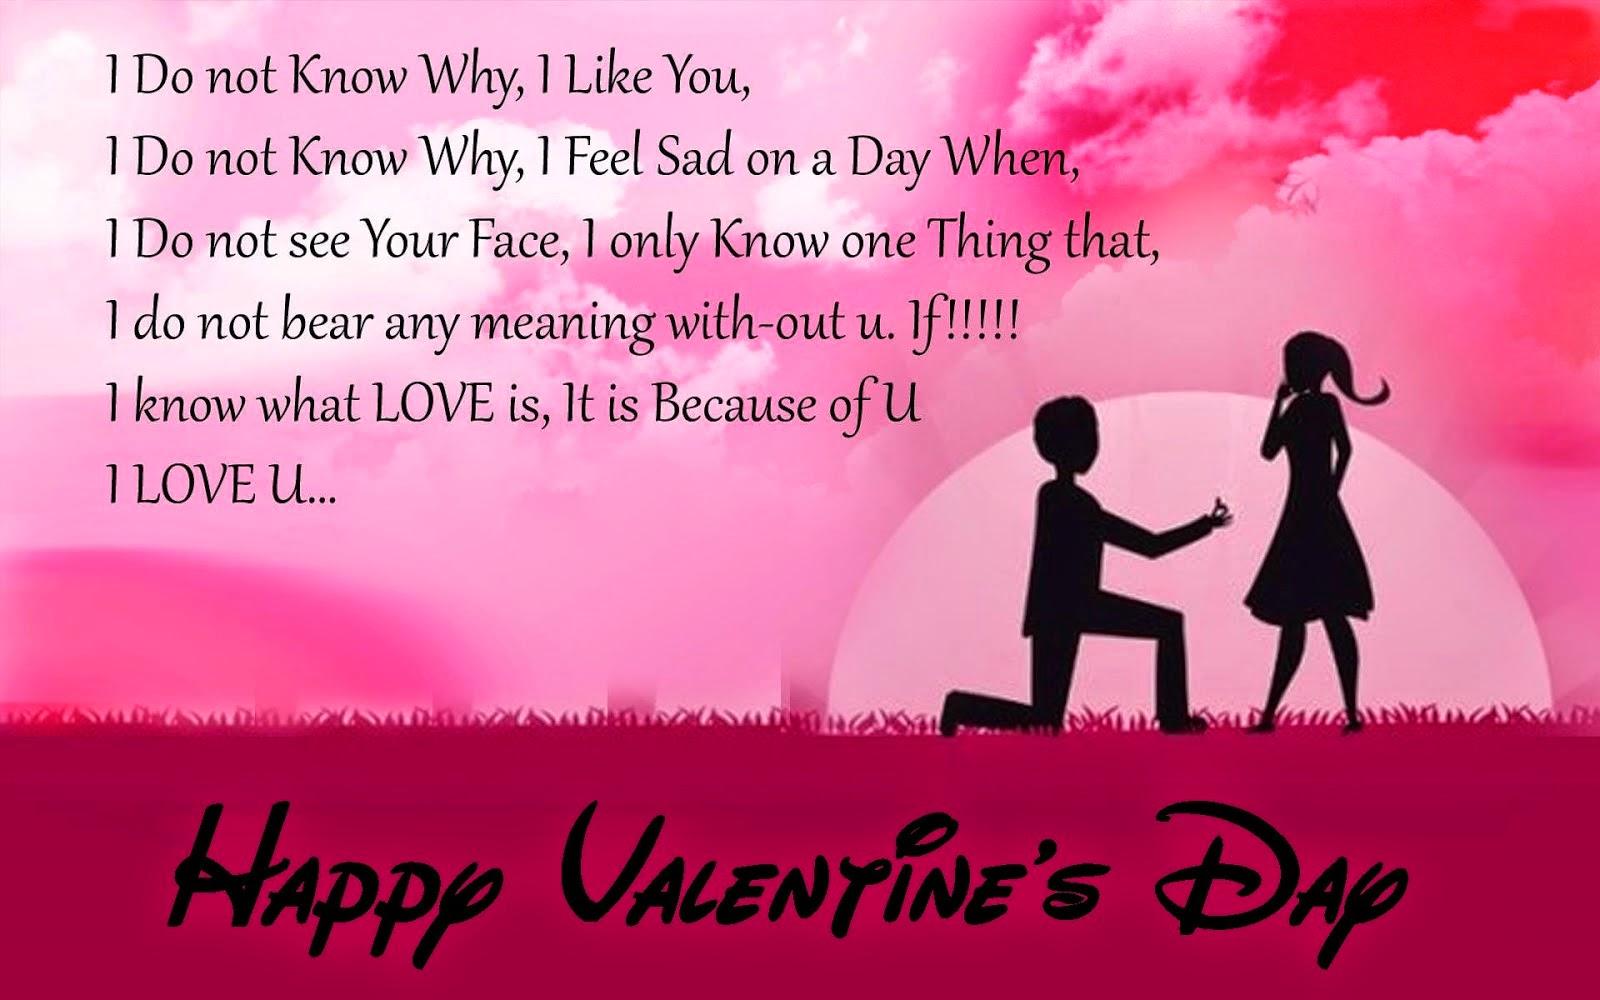 Happy Valentines Day Greetings: